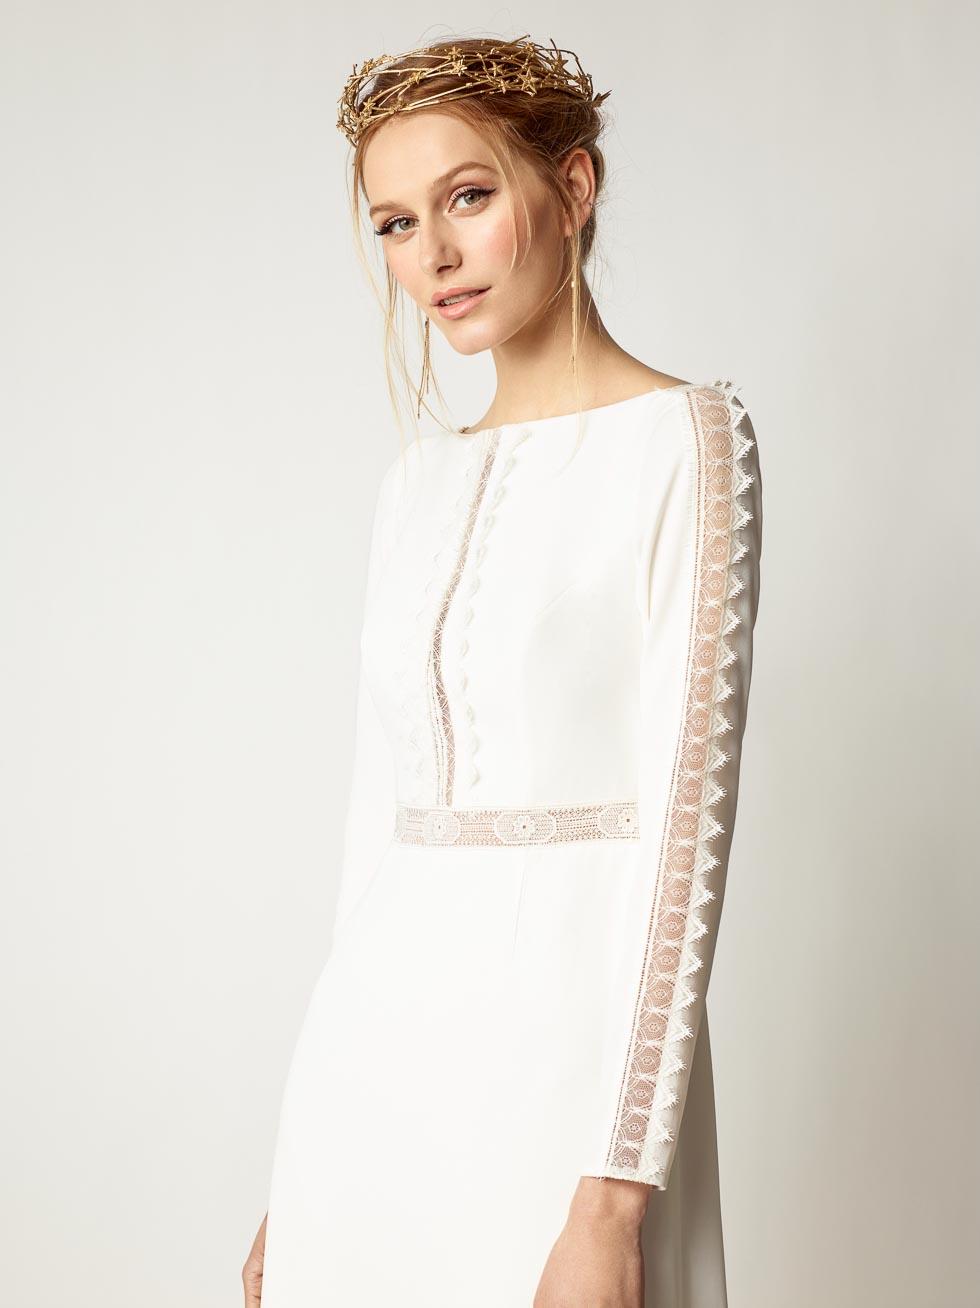 Rembo styling Brautkleider Kollektion 2017